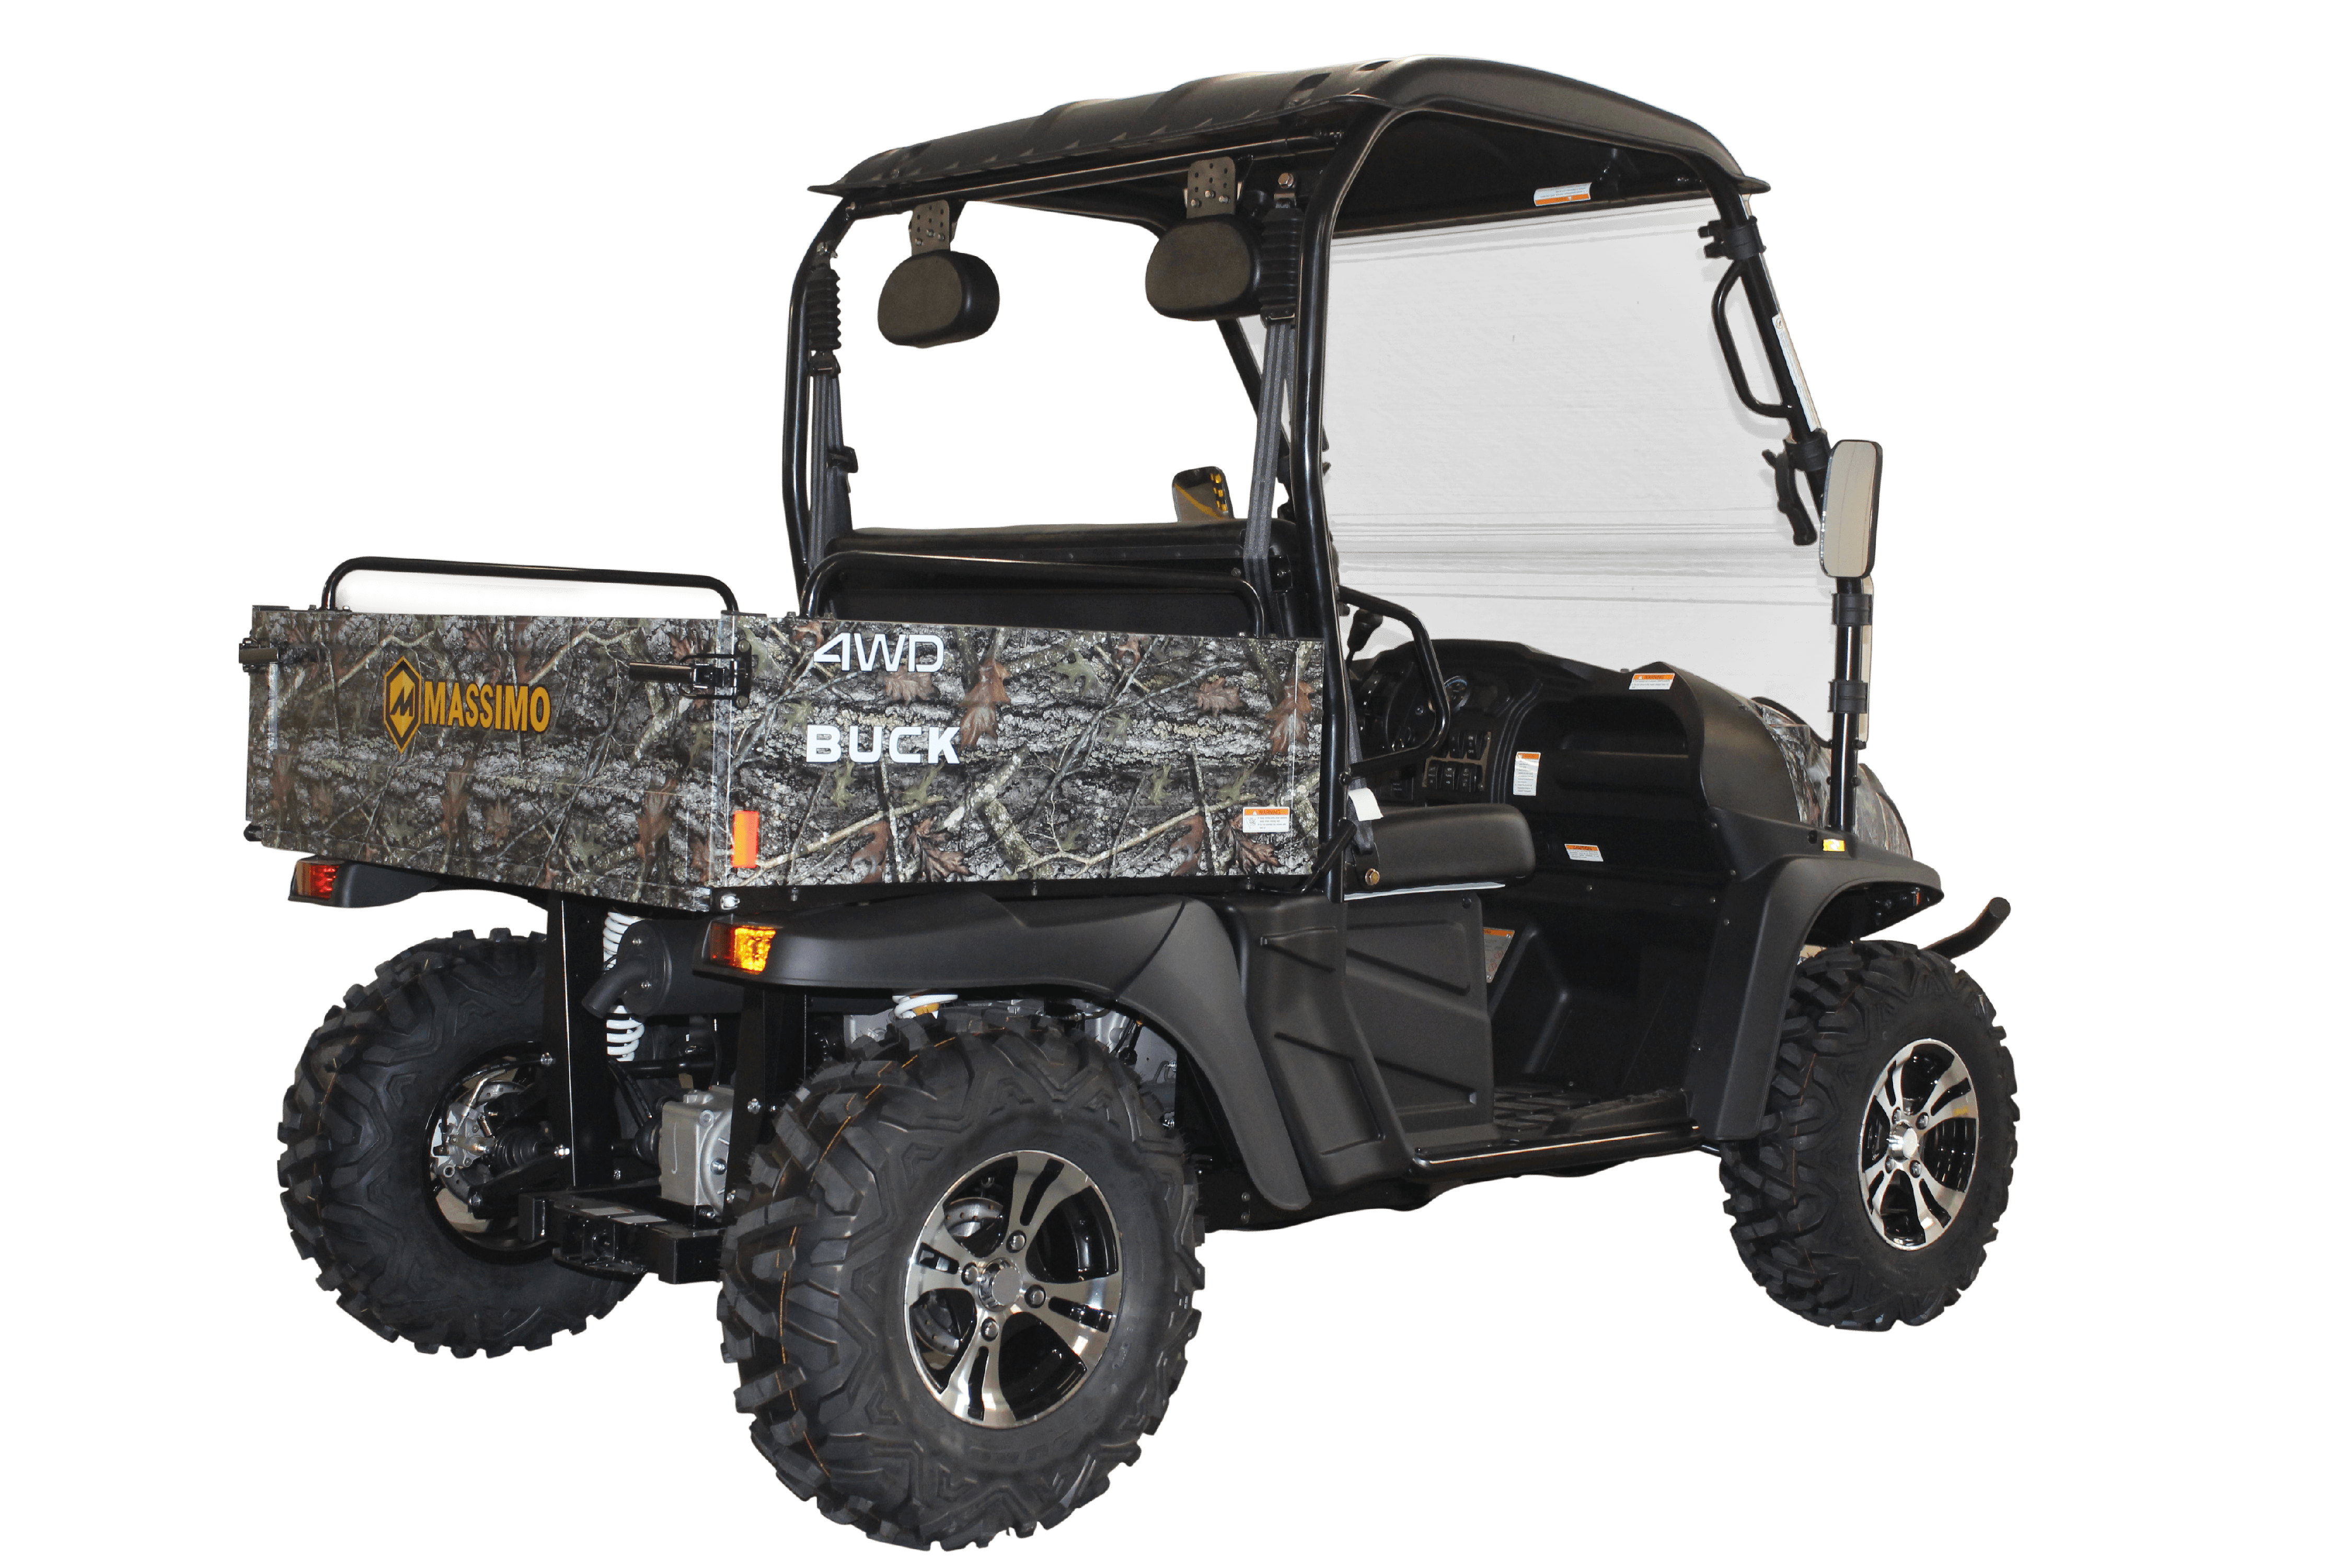 MASSIMO BUCK 400 UTV | 2WD/4WD, 391cc EFI UTV GOLF CART